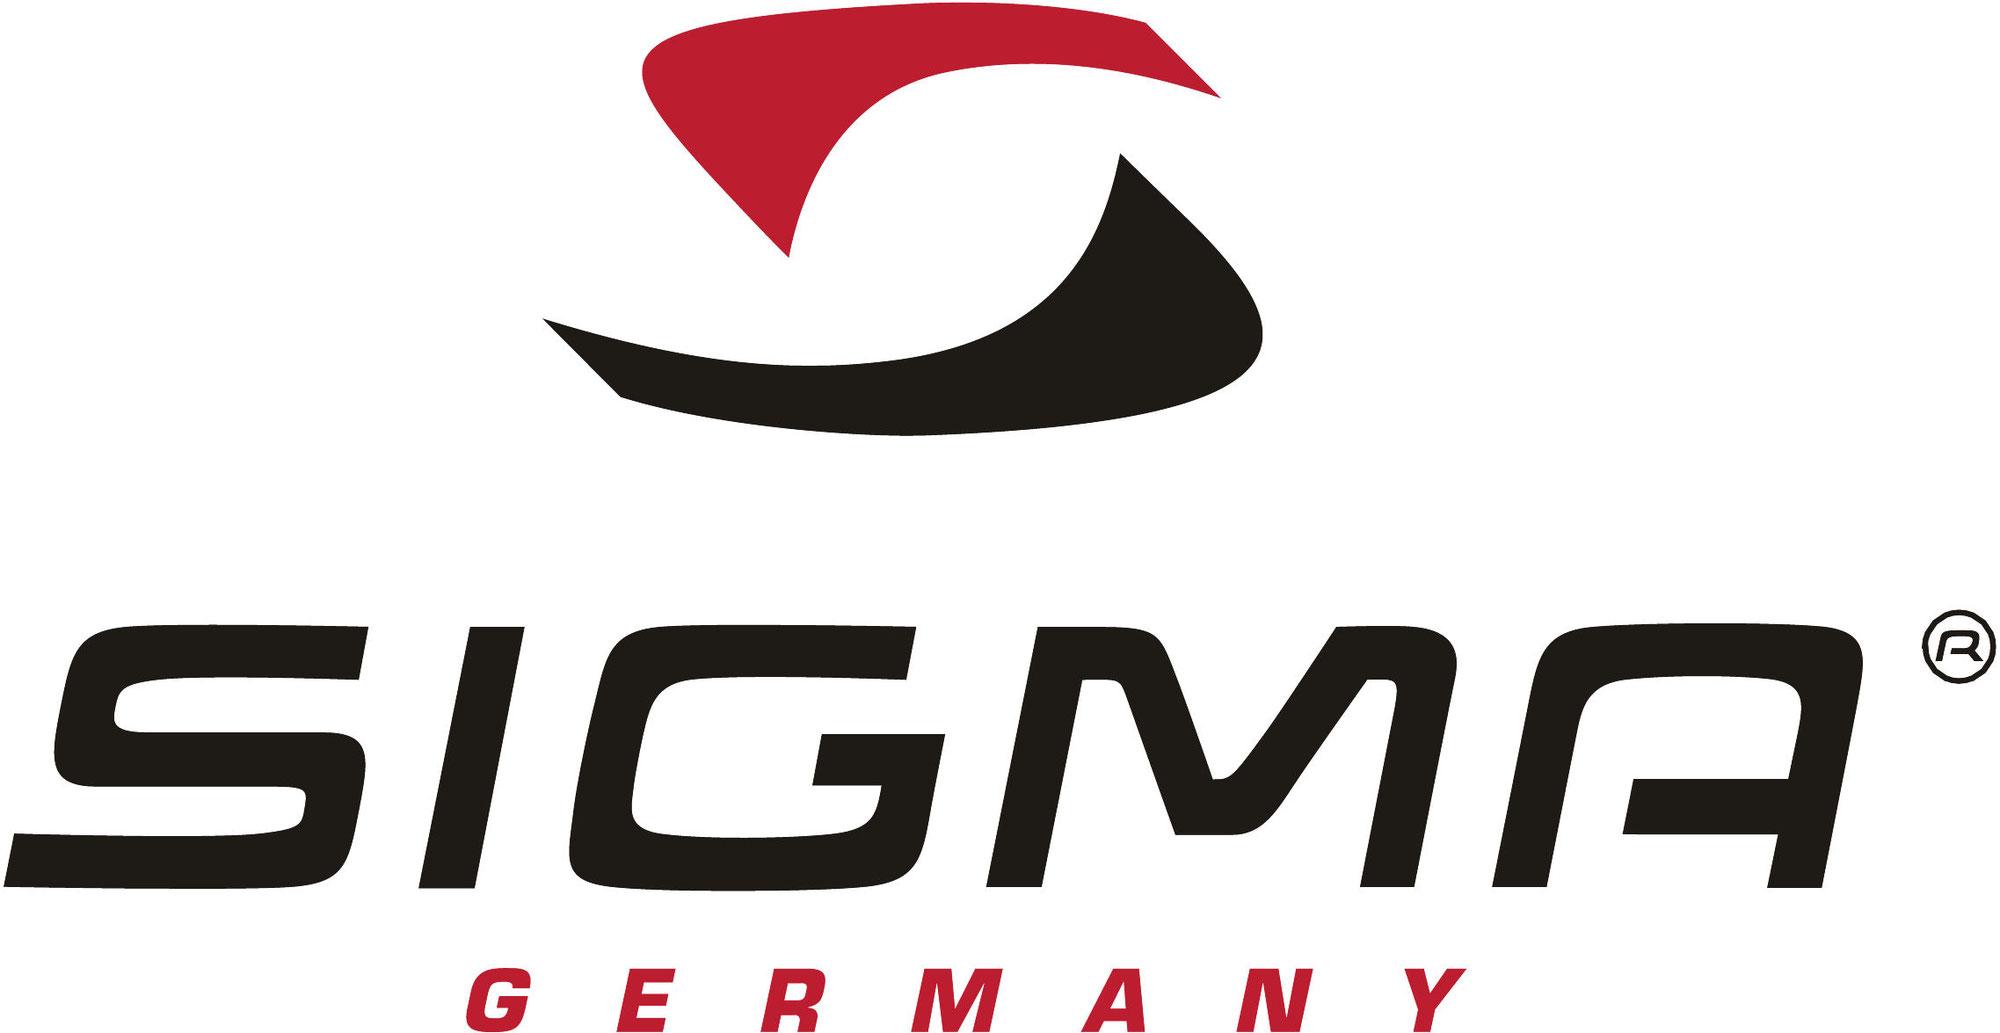 Neu im Team Sigma: Director Business Development Lars Adloff